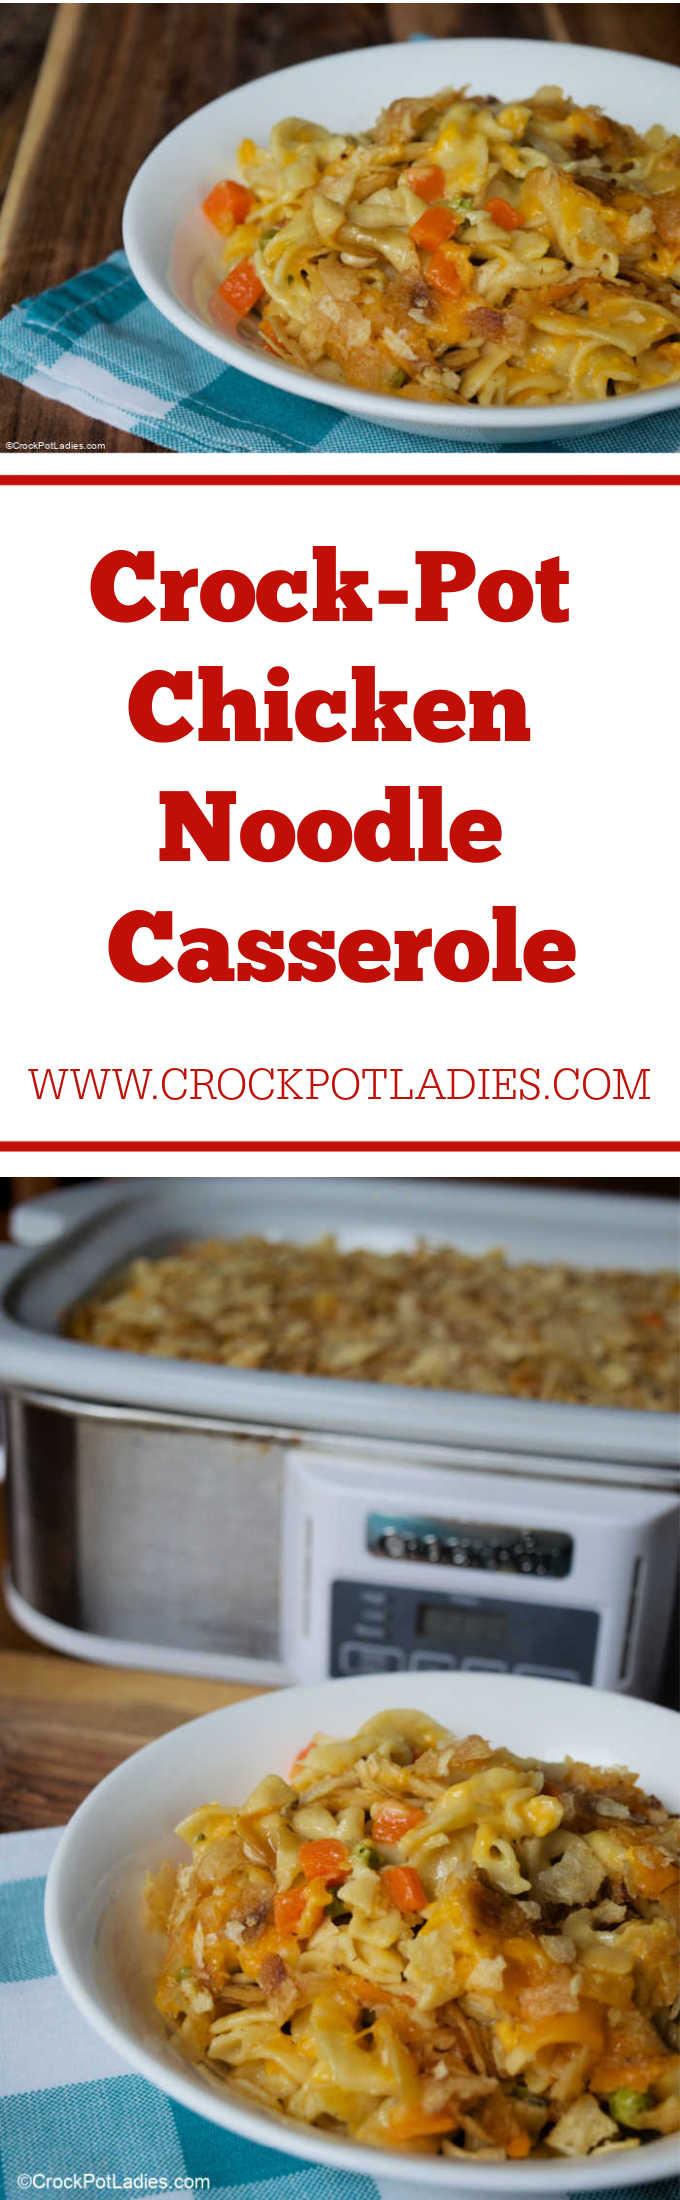 Crock-Pot Chicken Noodle Casserole